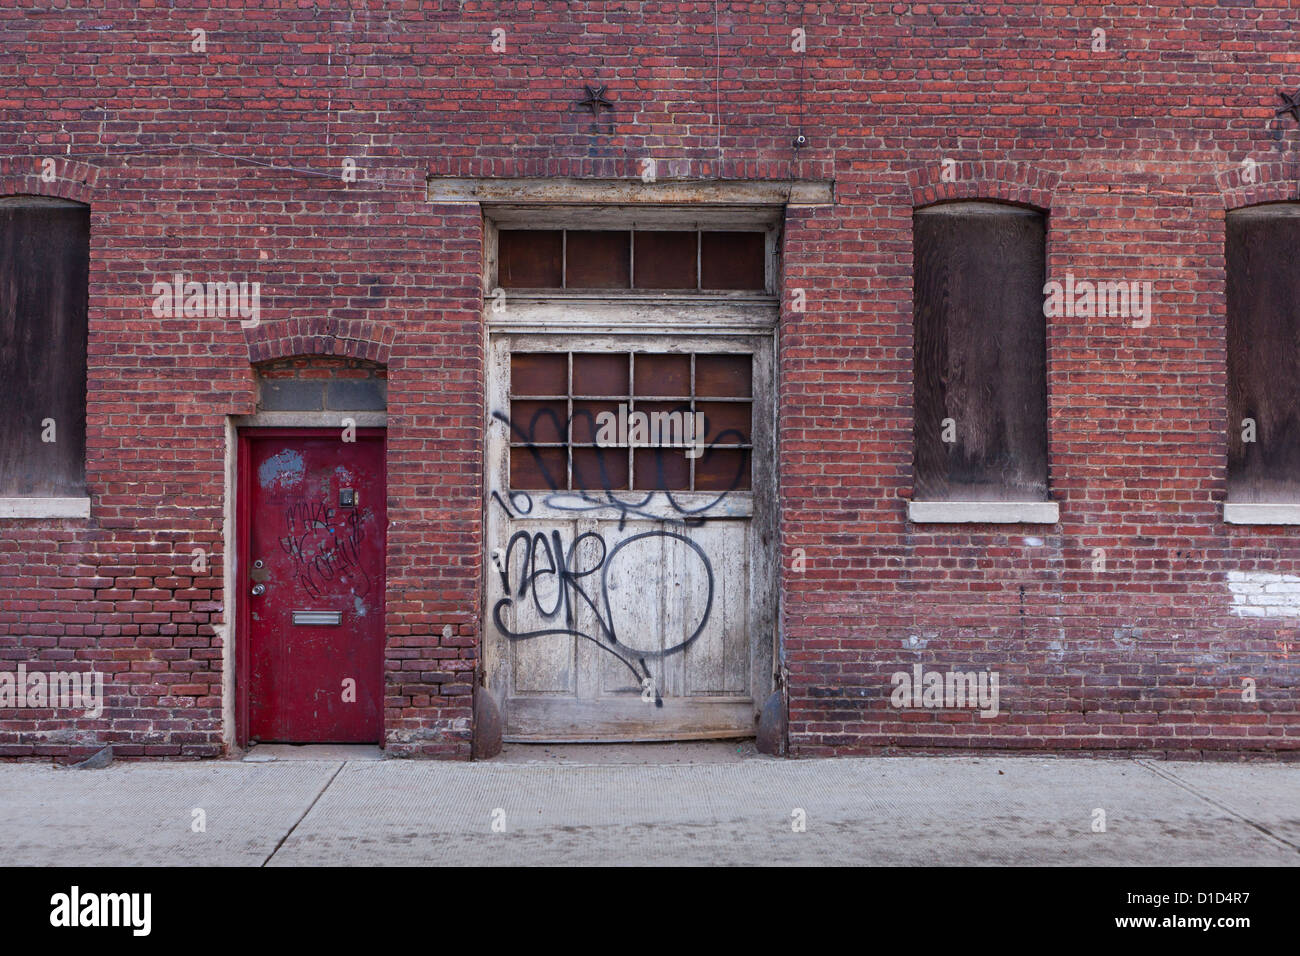 Old garage door of brick building Stock Photo, Royalty Free Image ...